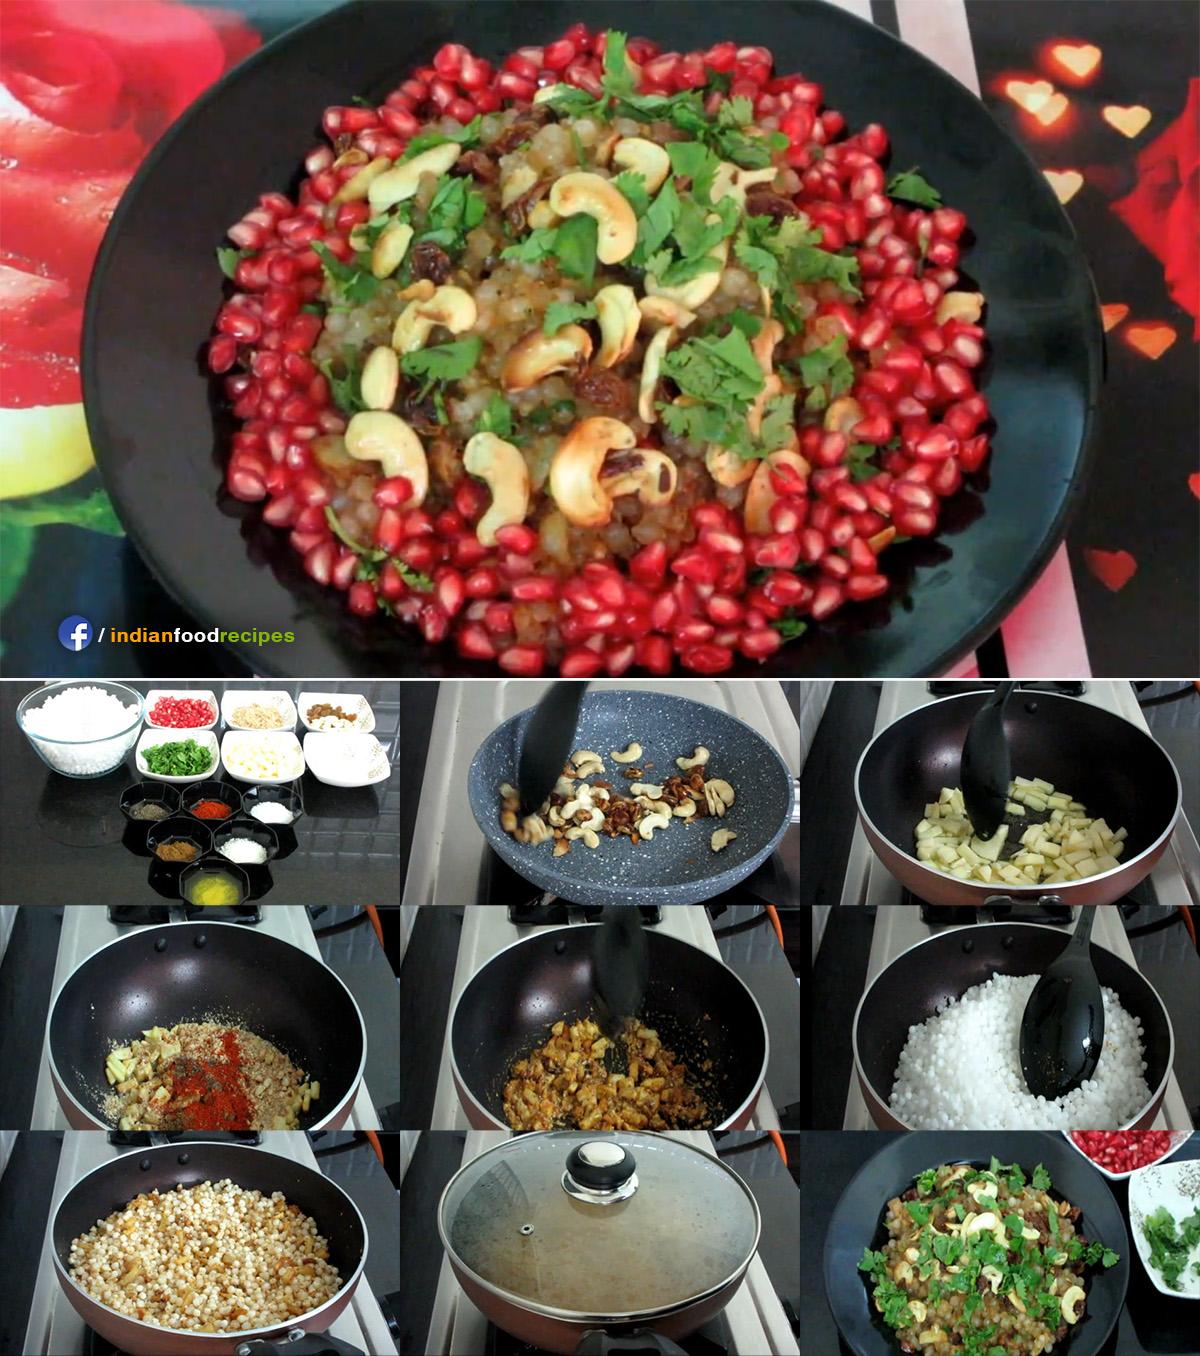 Sabudana Khichdi recipe step by step